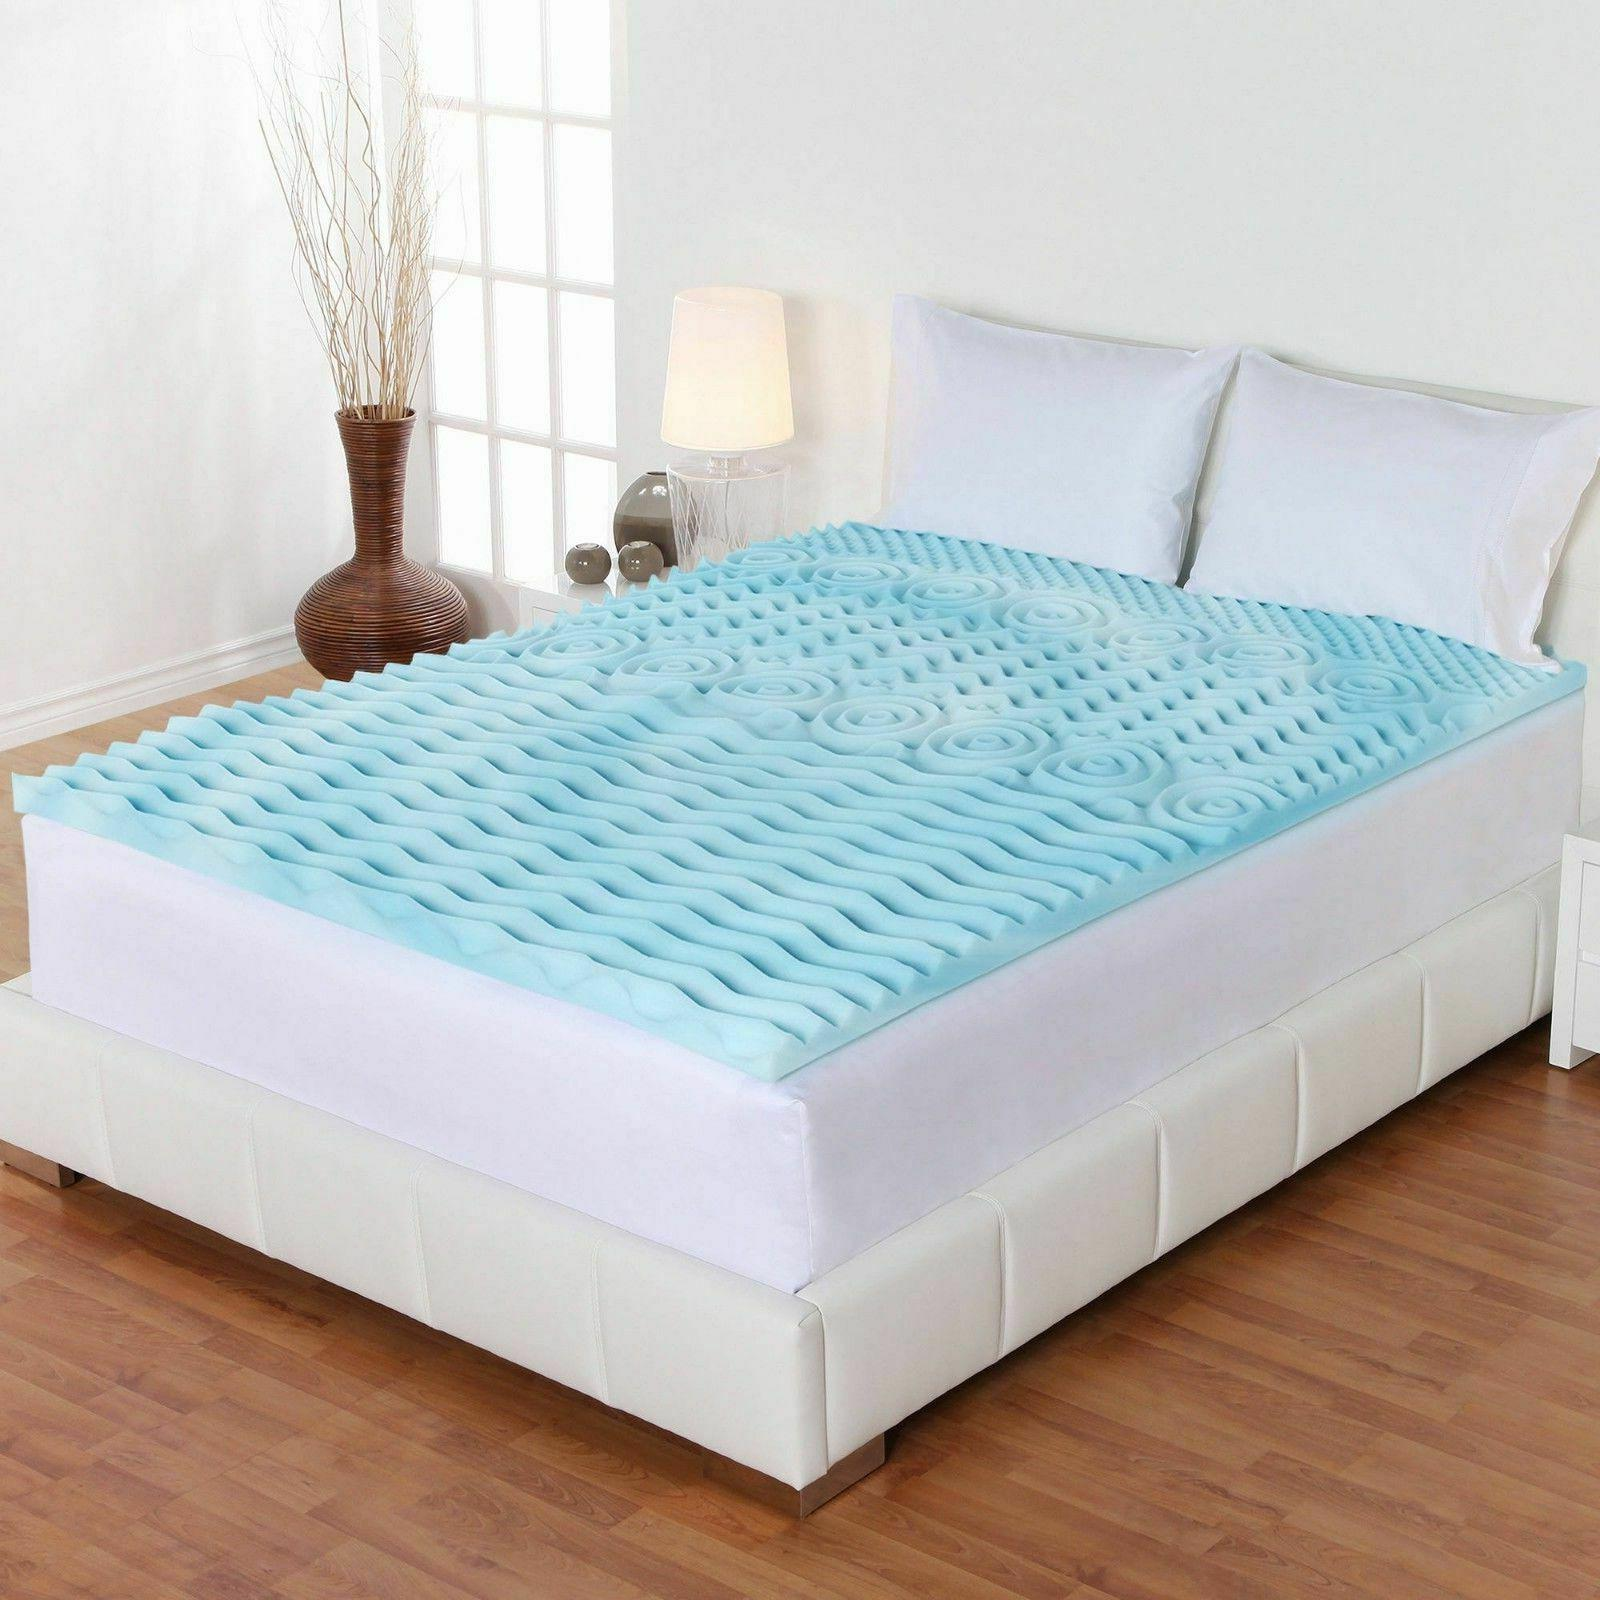 Orthopedic Bed Pad 5-Zone Authentic Comfort 3-Inch Foam Matt